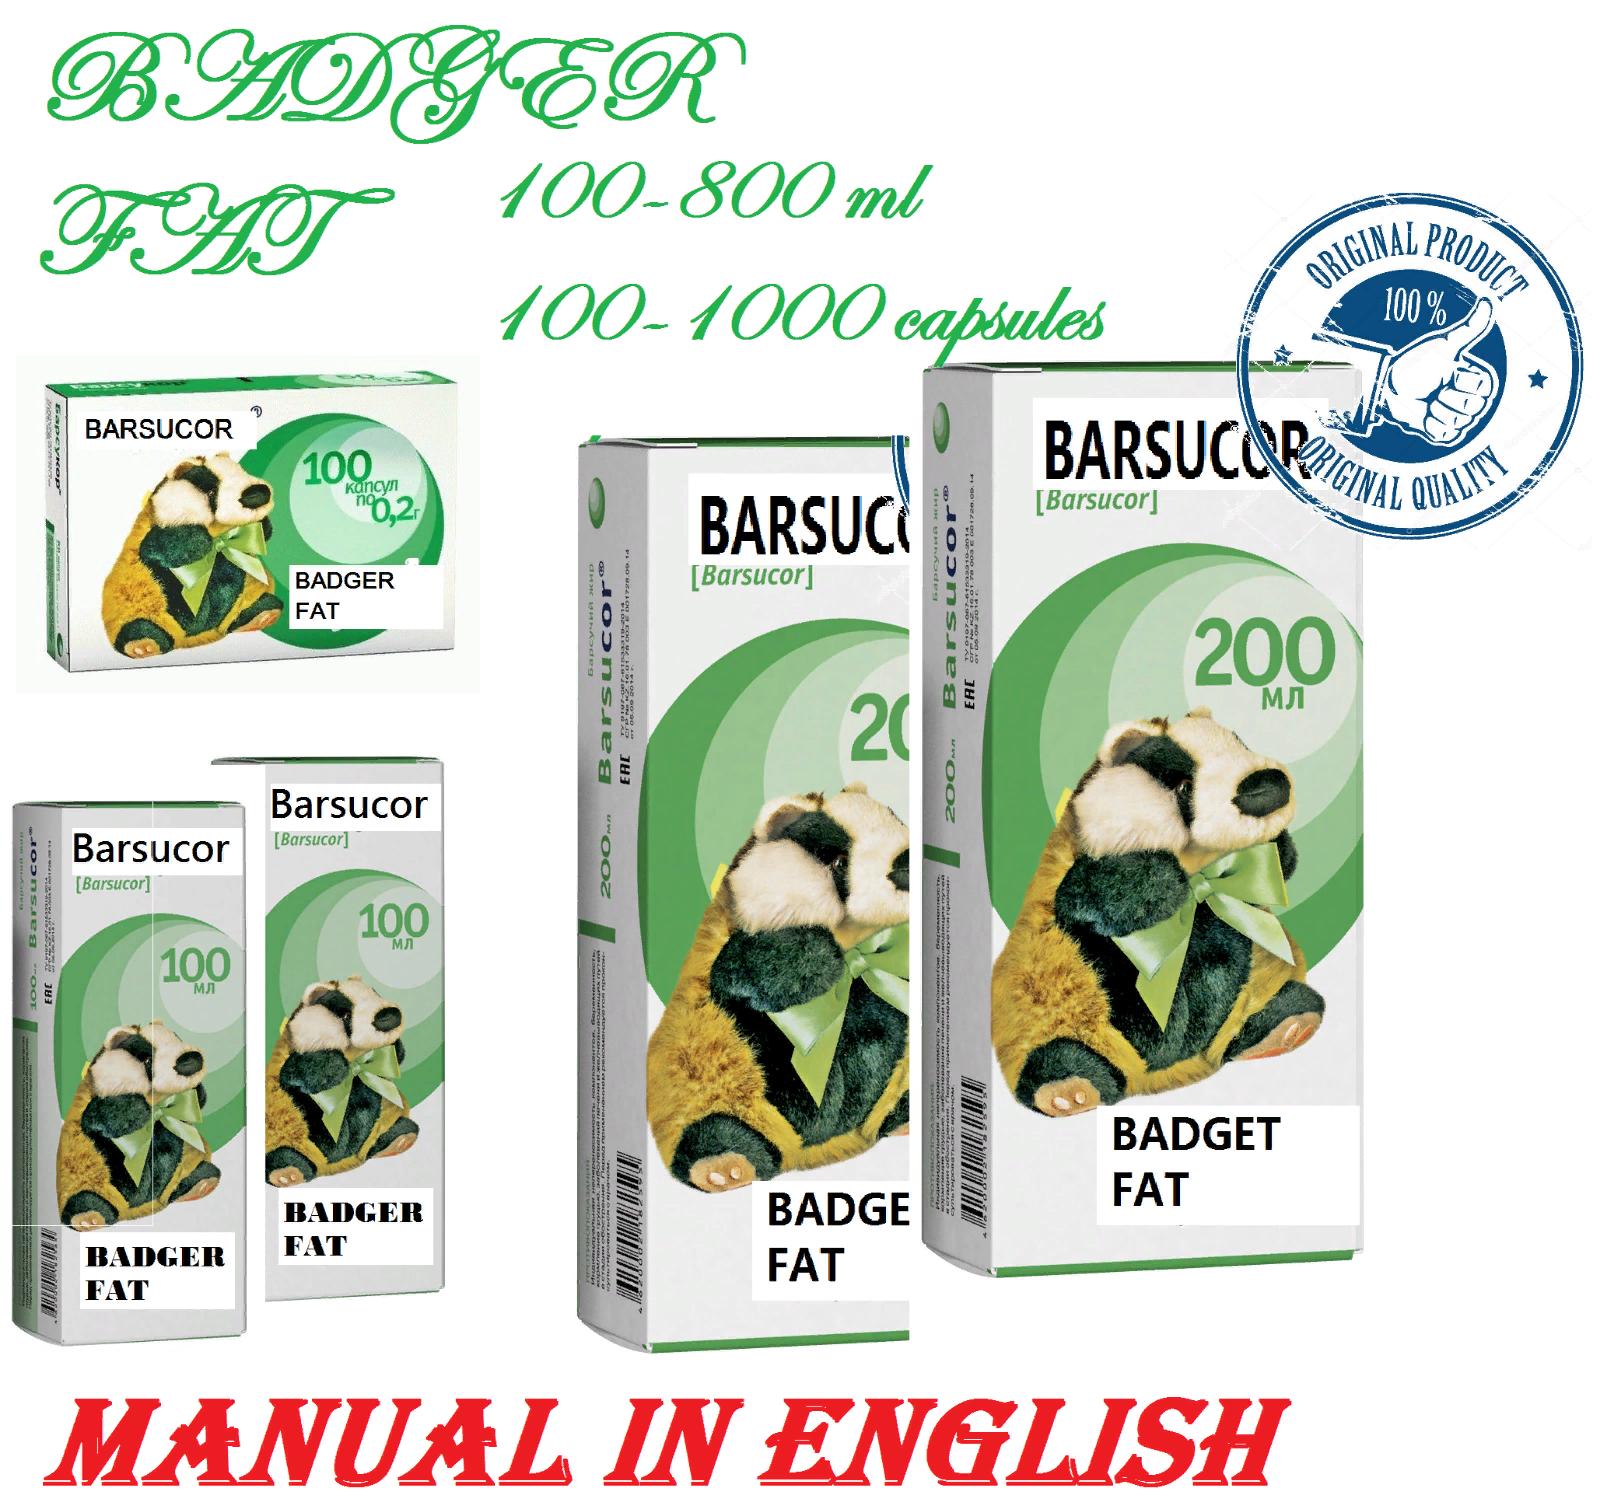 Natural 100-800ml / 100-1000 capsules. Badger fat (Barsucor) RUSSIA - $15.49 - $89.00